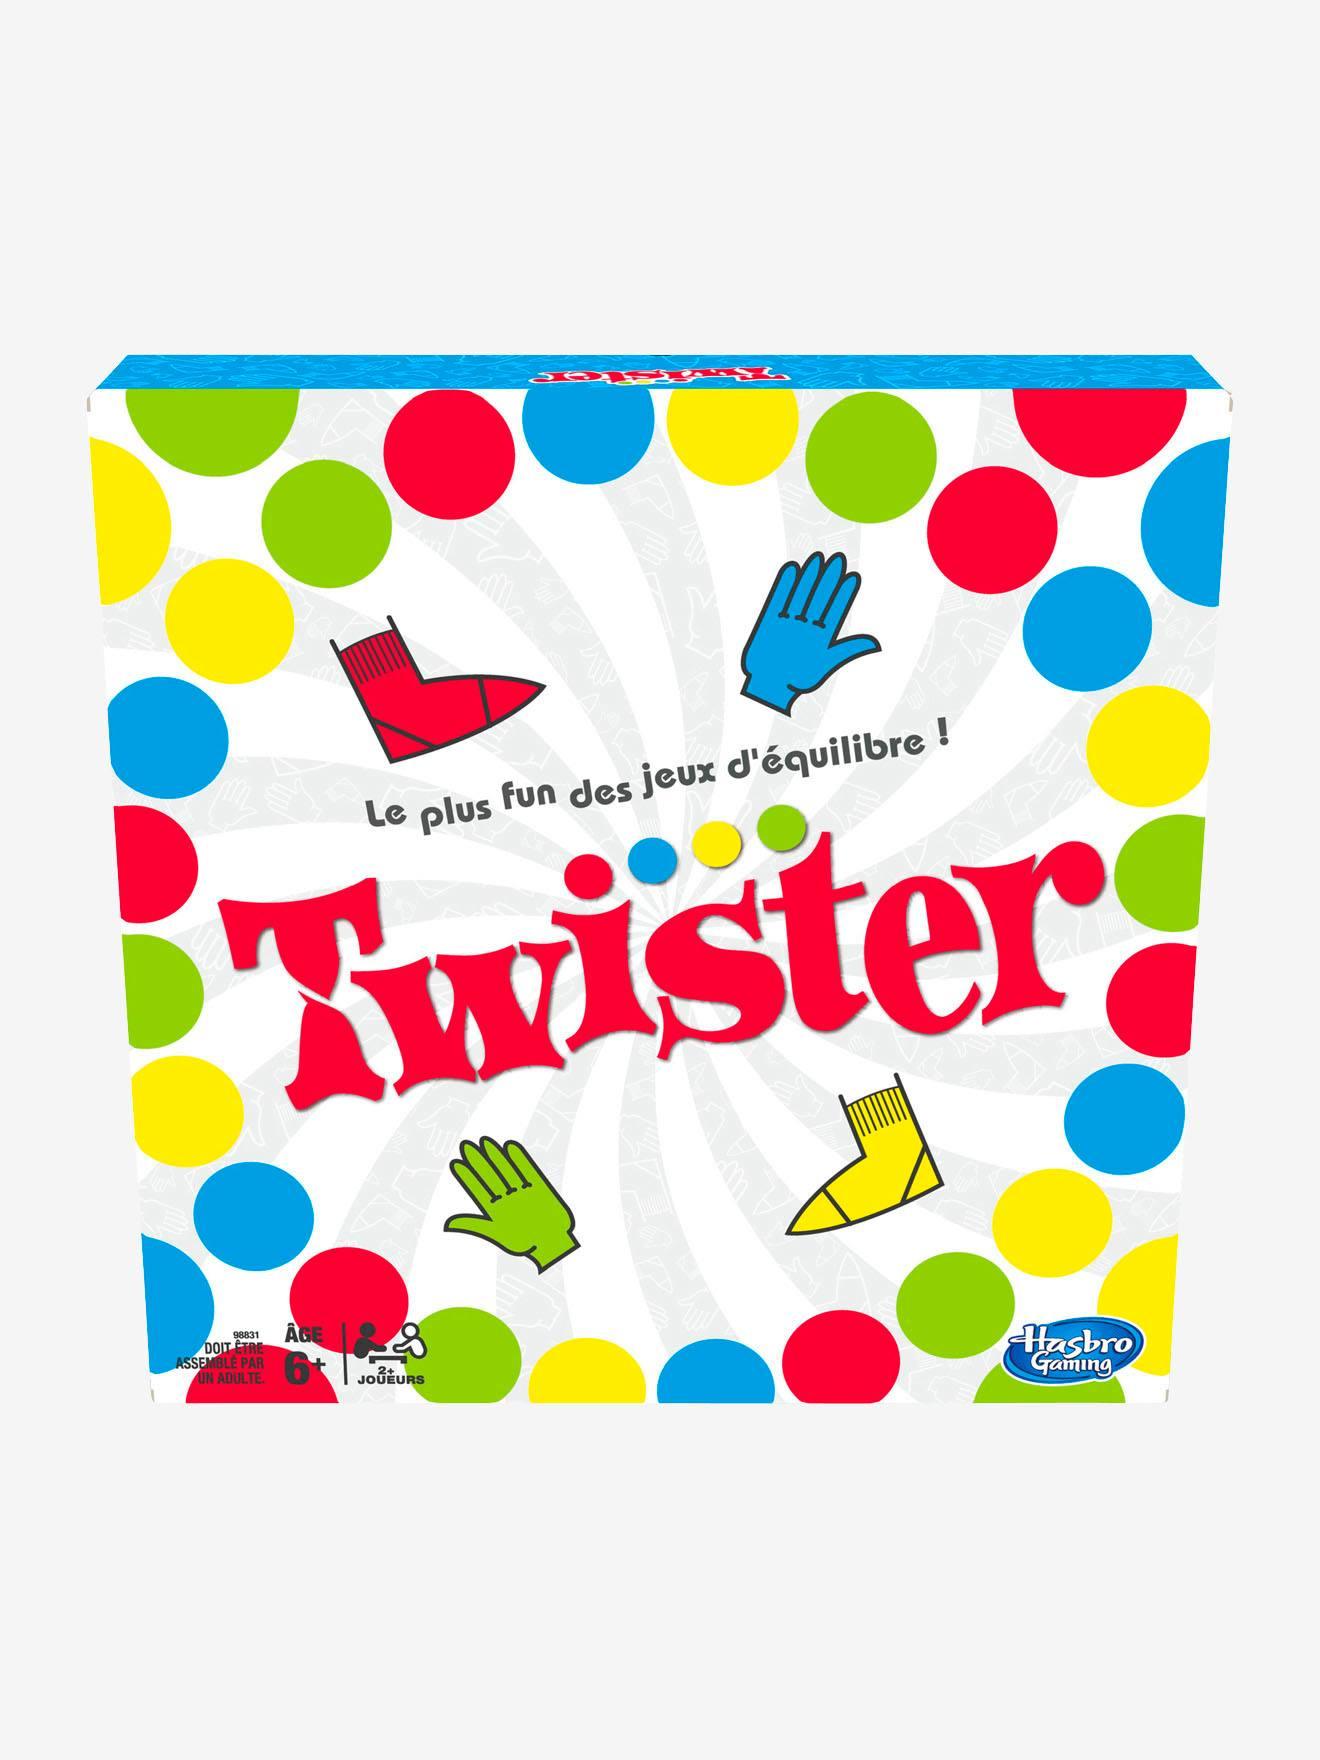 Twister - Hasbro Gaming vert